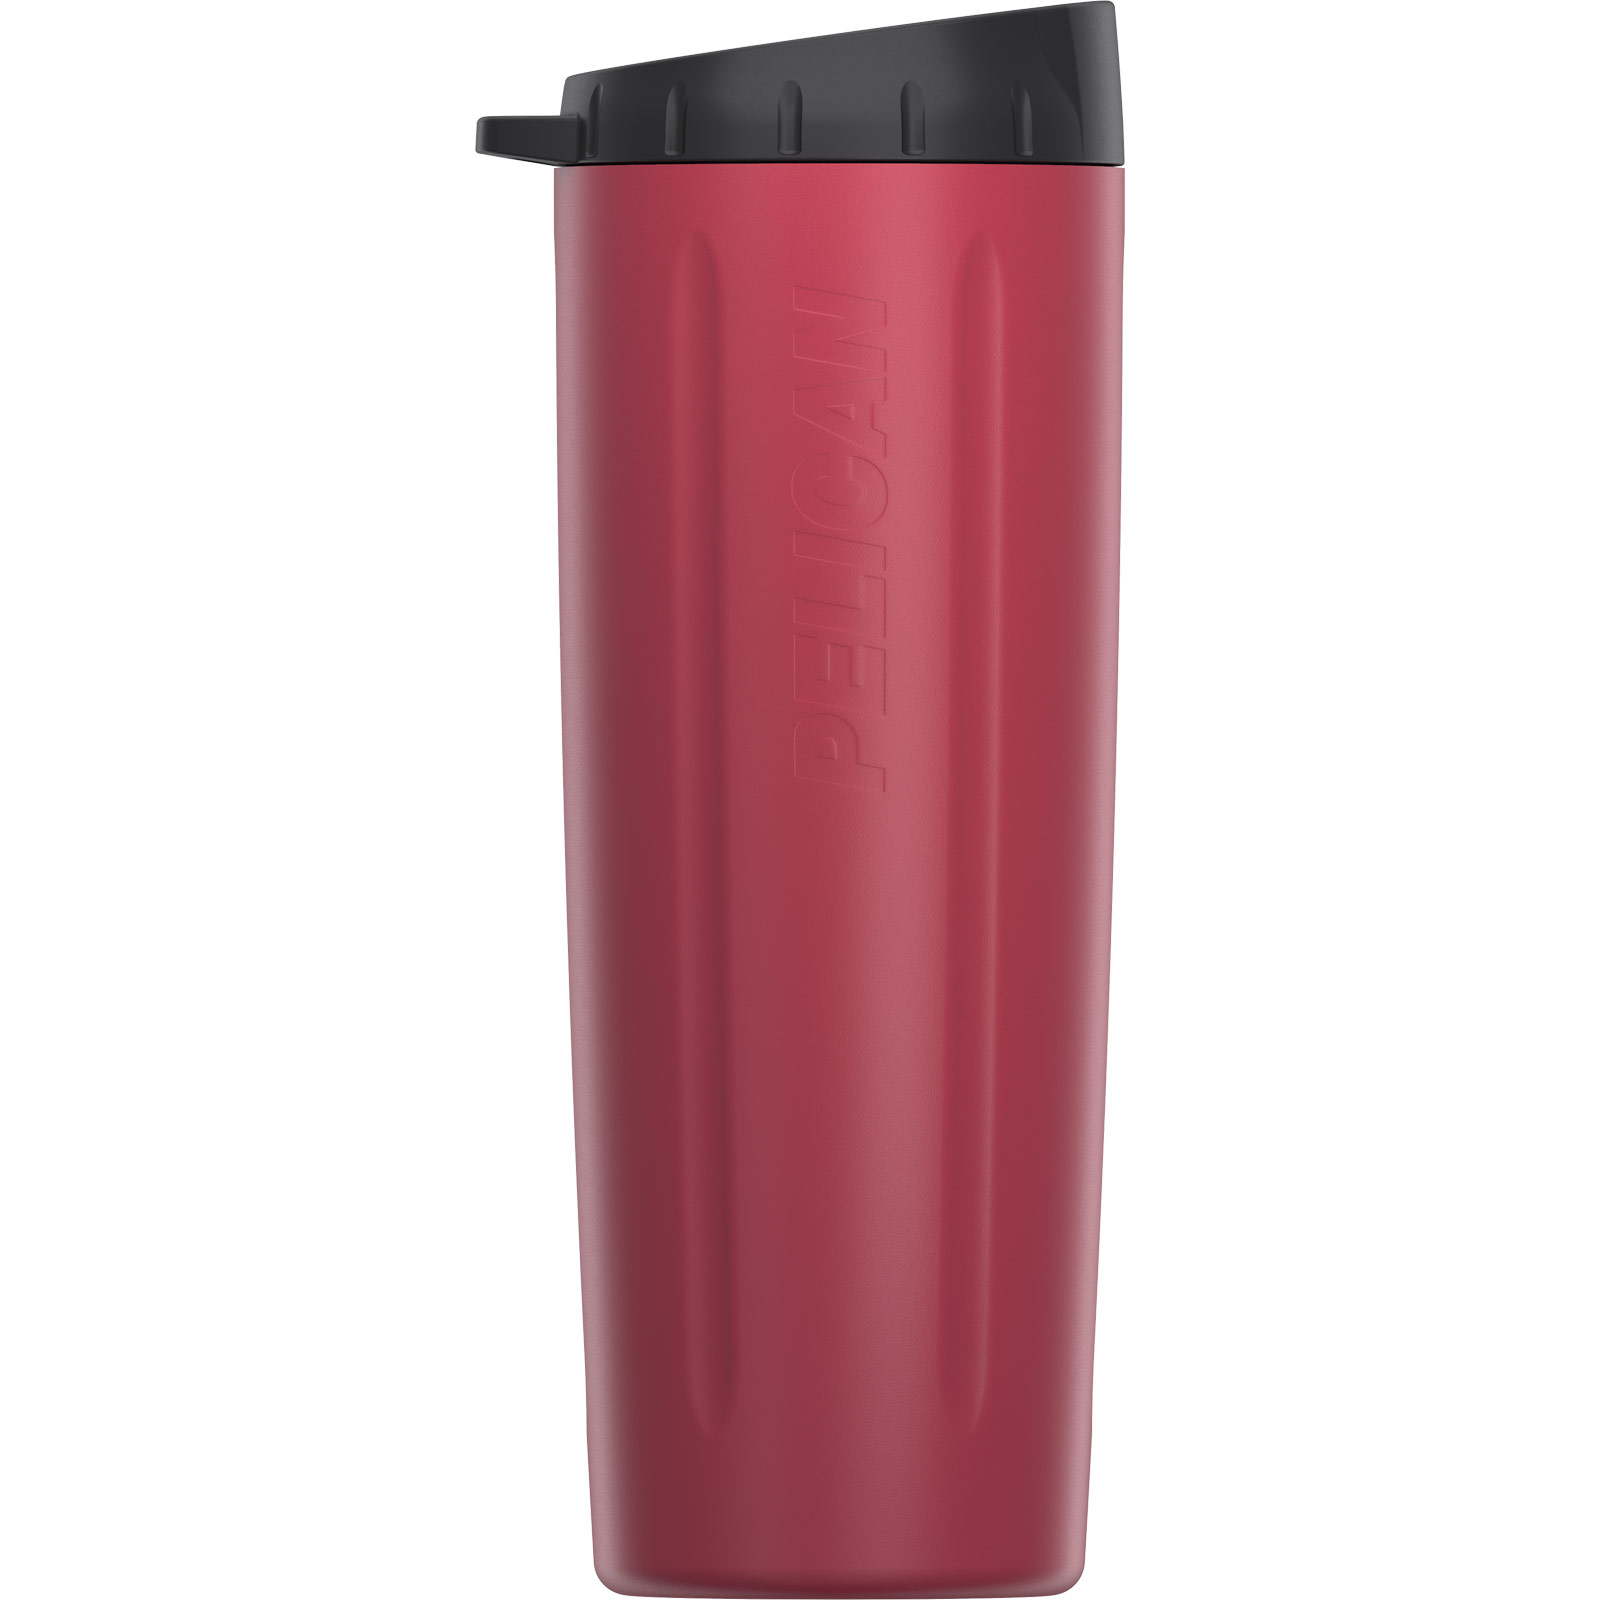 pelican 22oz red leakproof drink tumbler